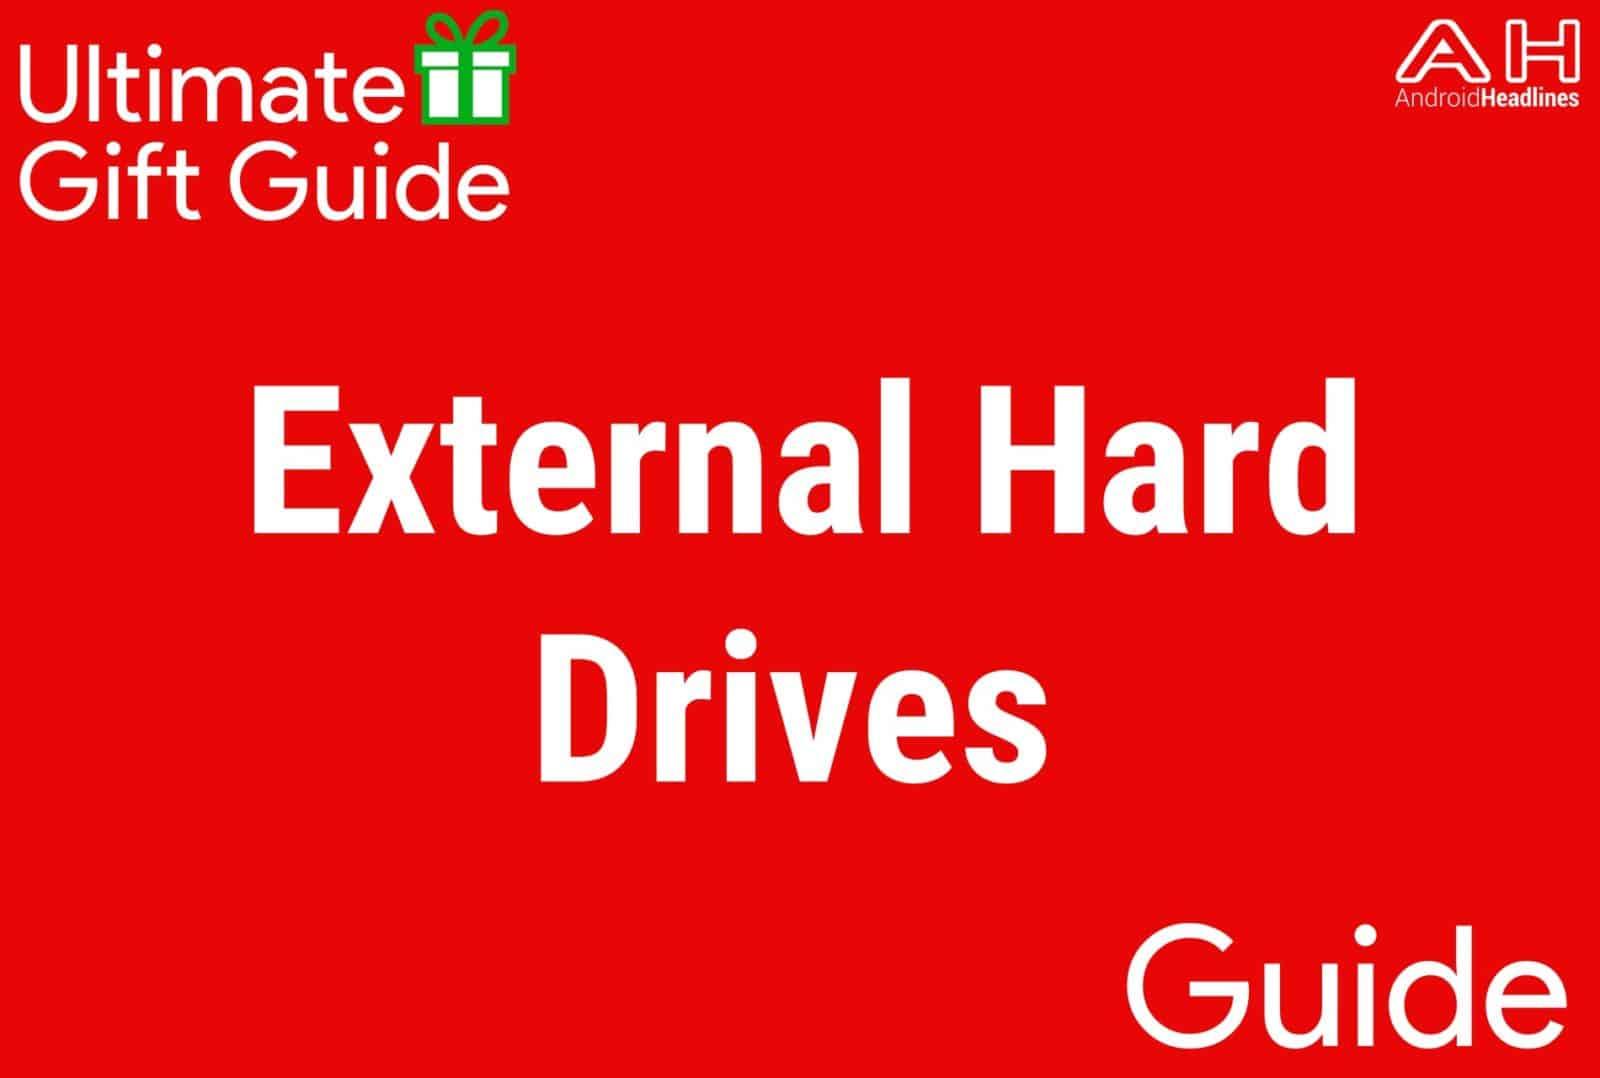 External Hard Drives - Gift Guide 2015-2016